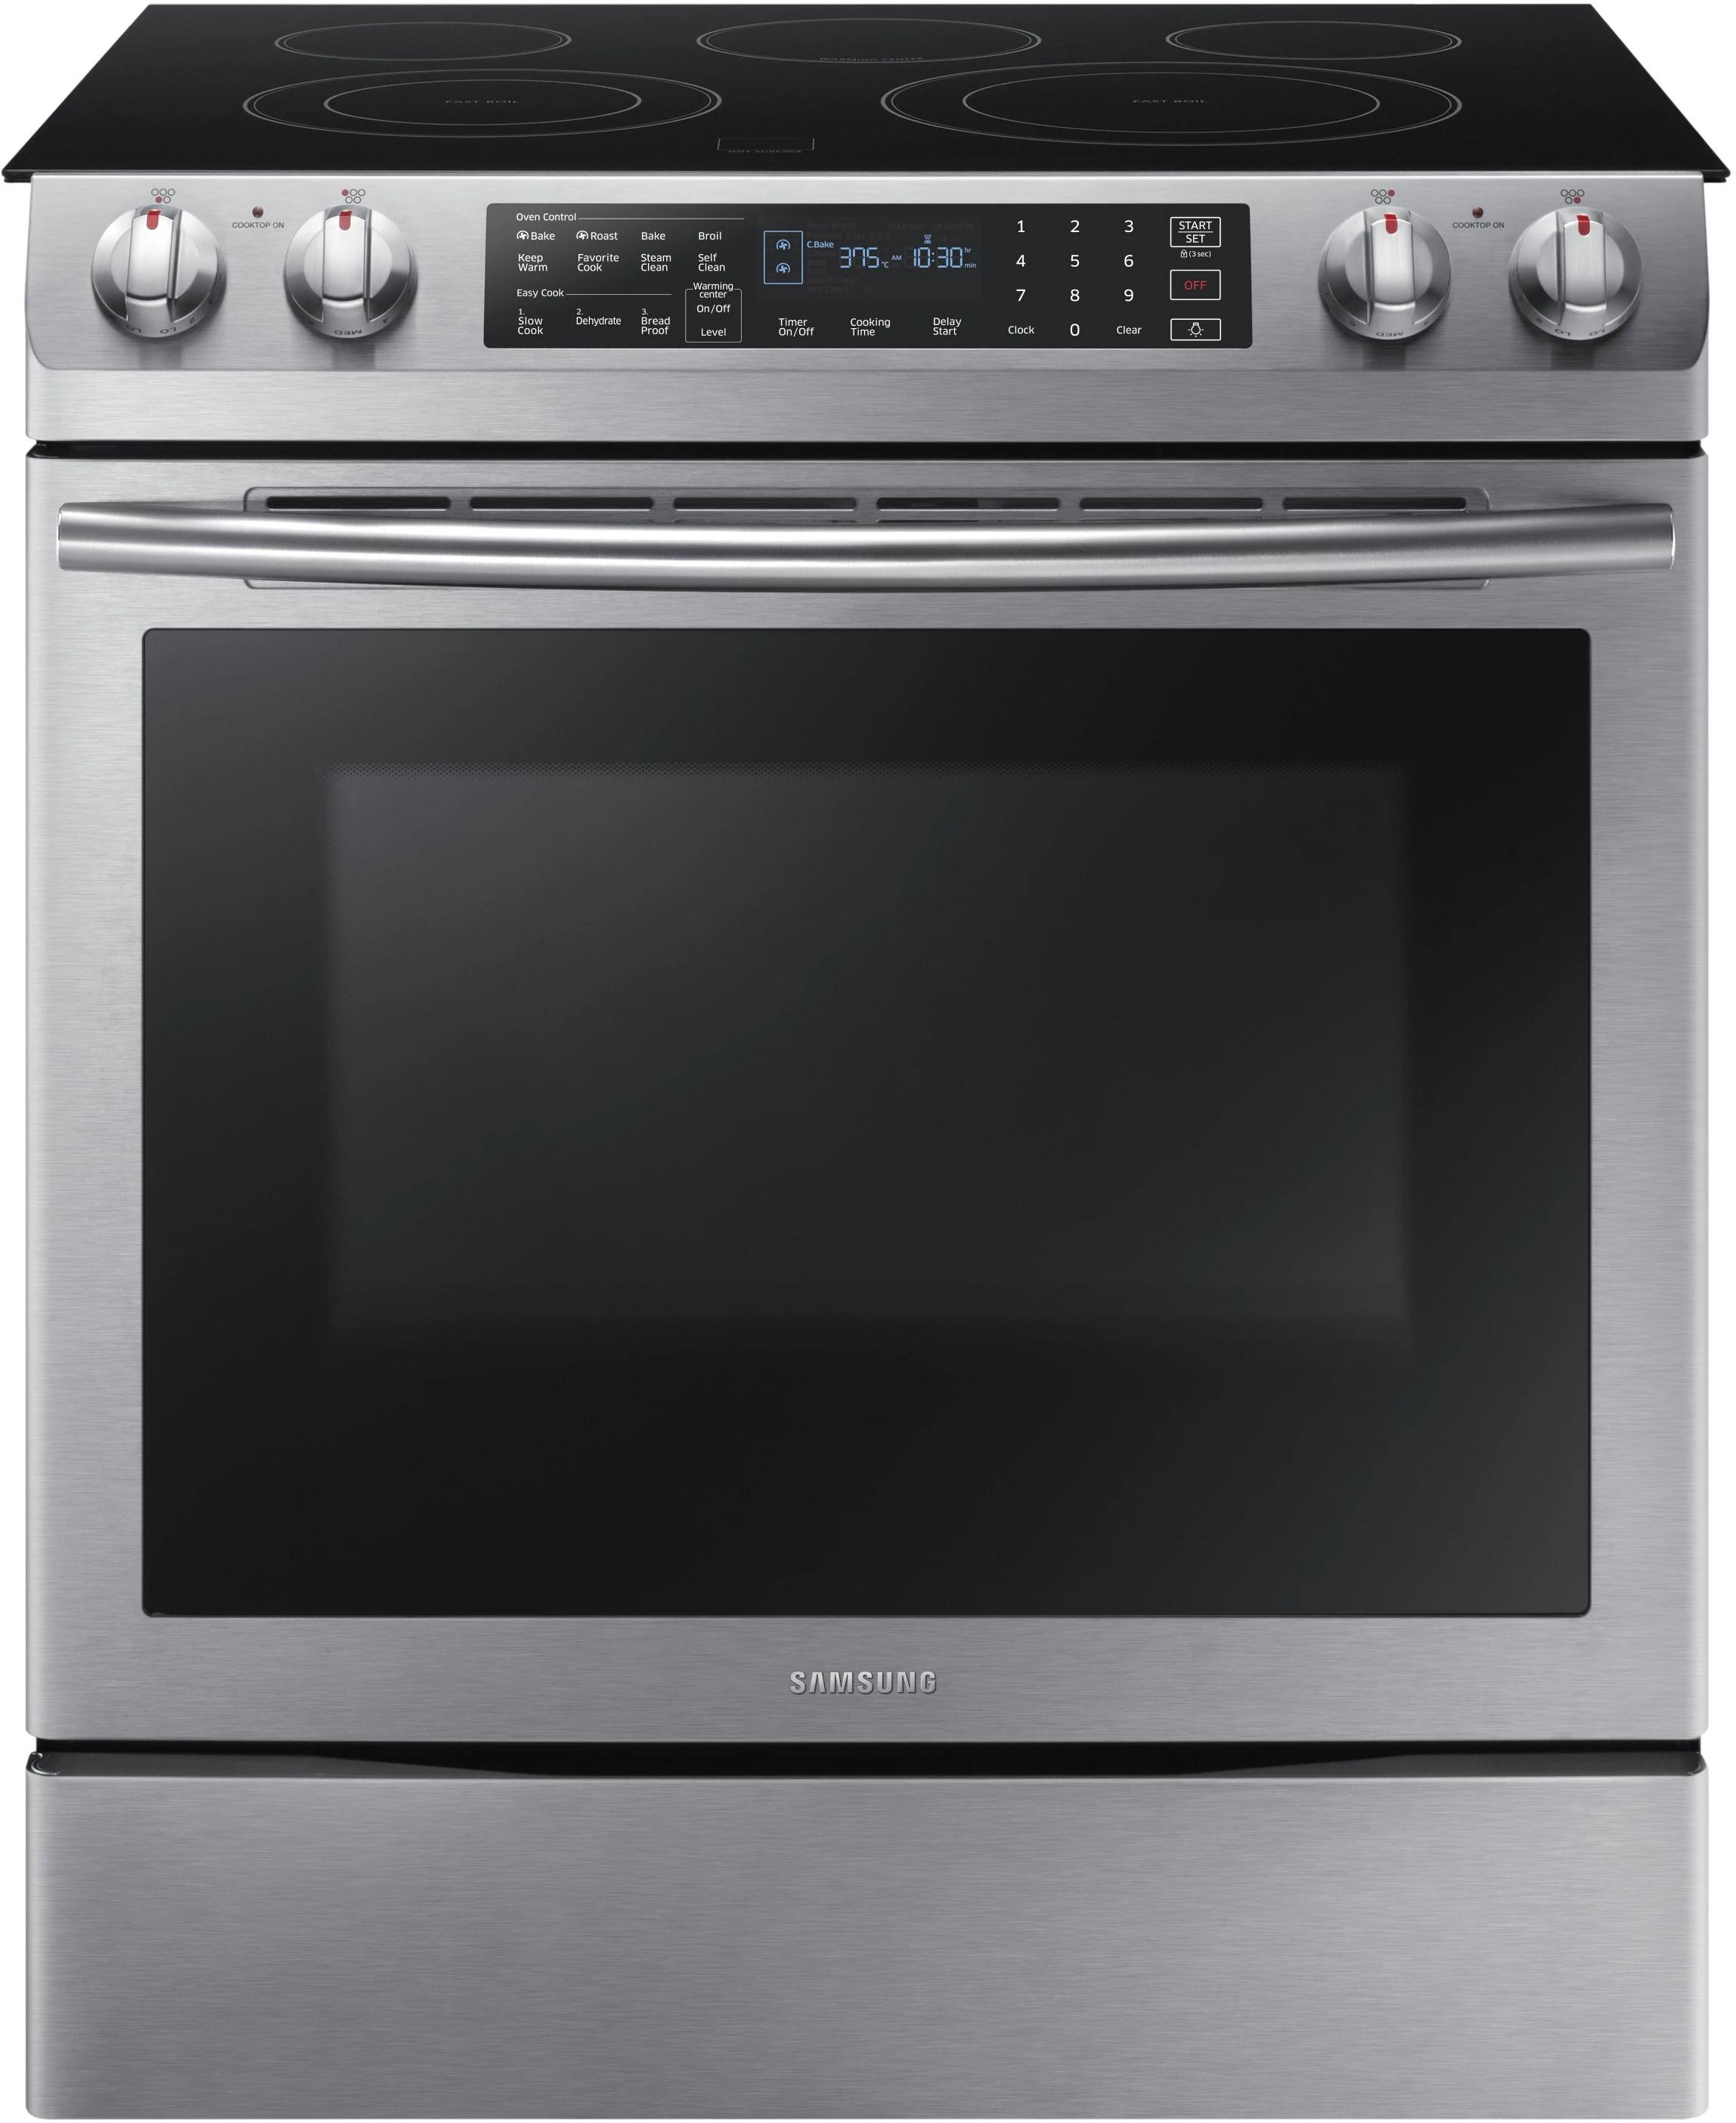 electric stove ford 1g alternator wiring diagram samsung ne58k9430ss 30 inch slide in range with 5